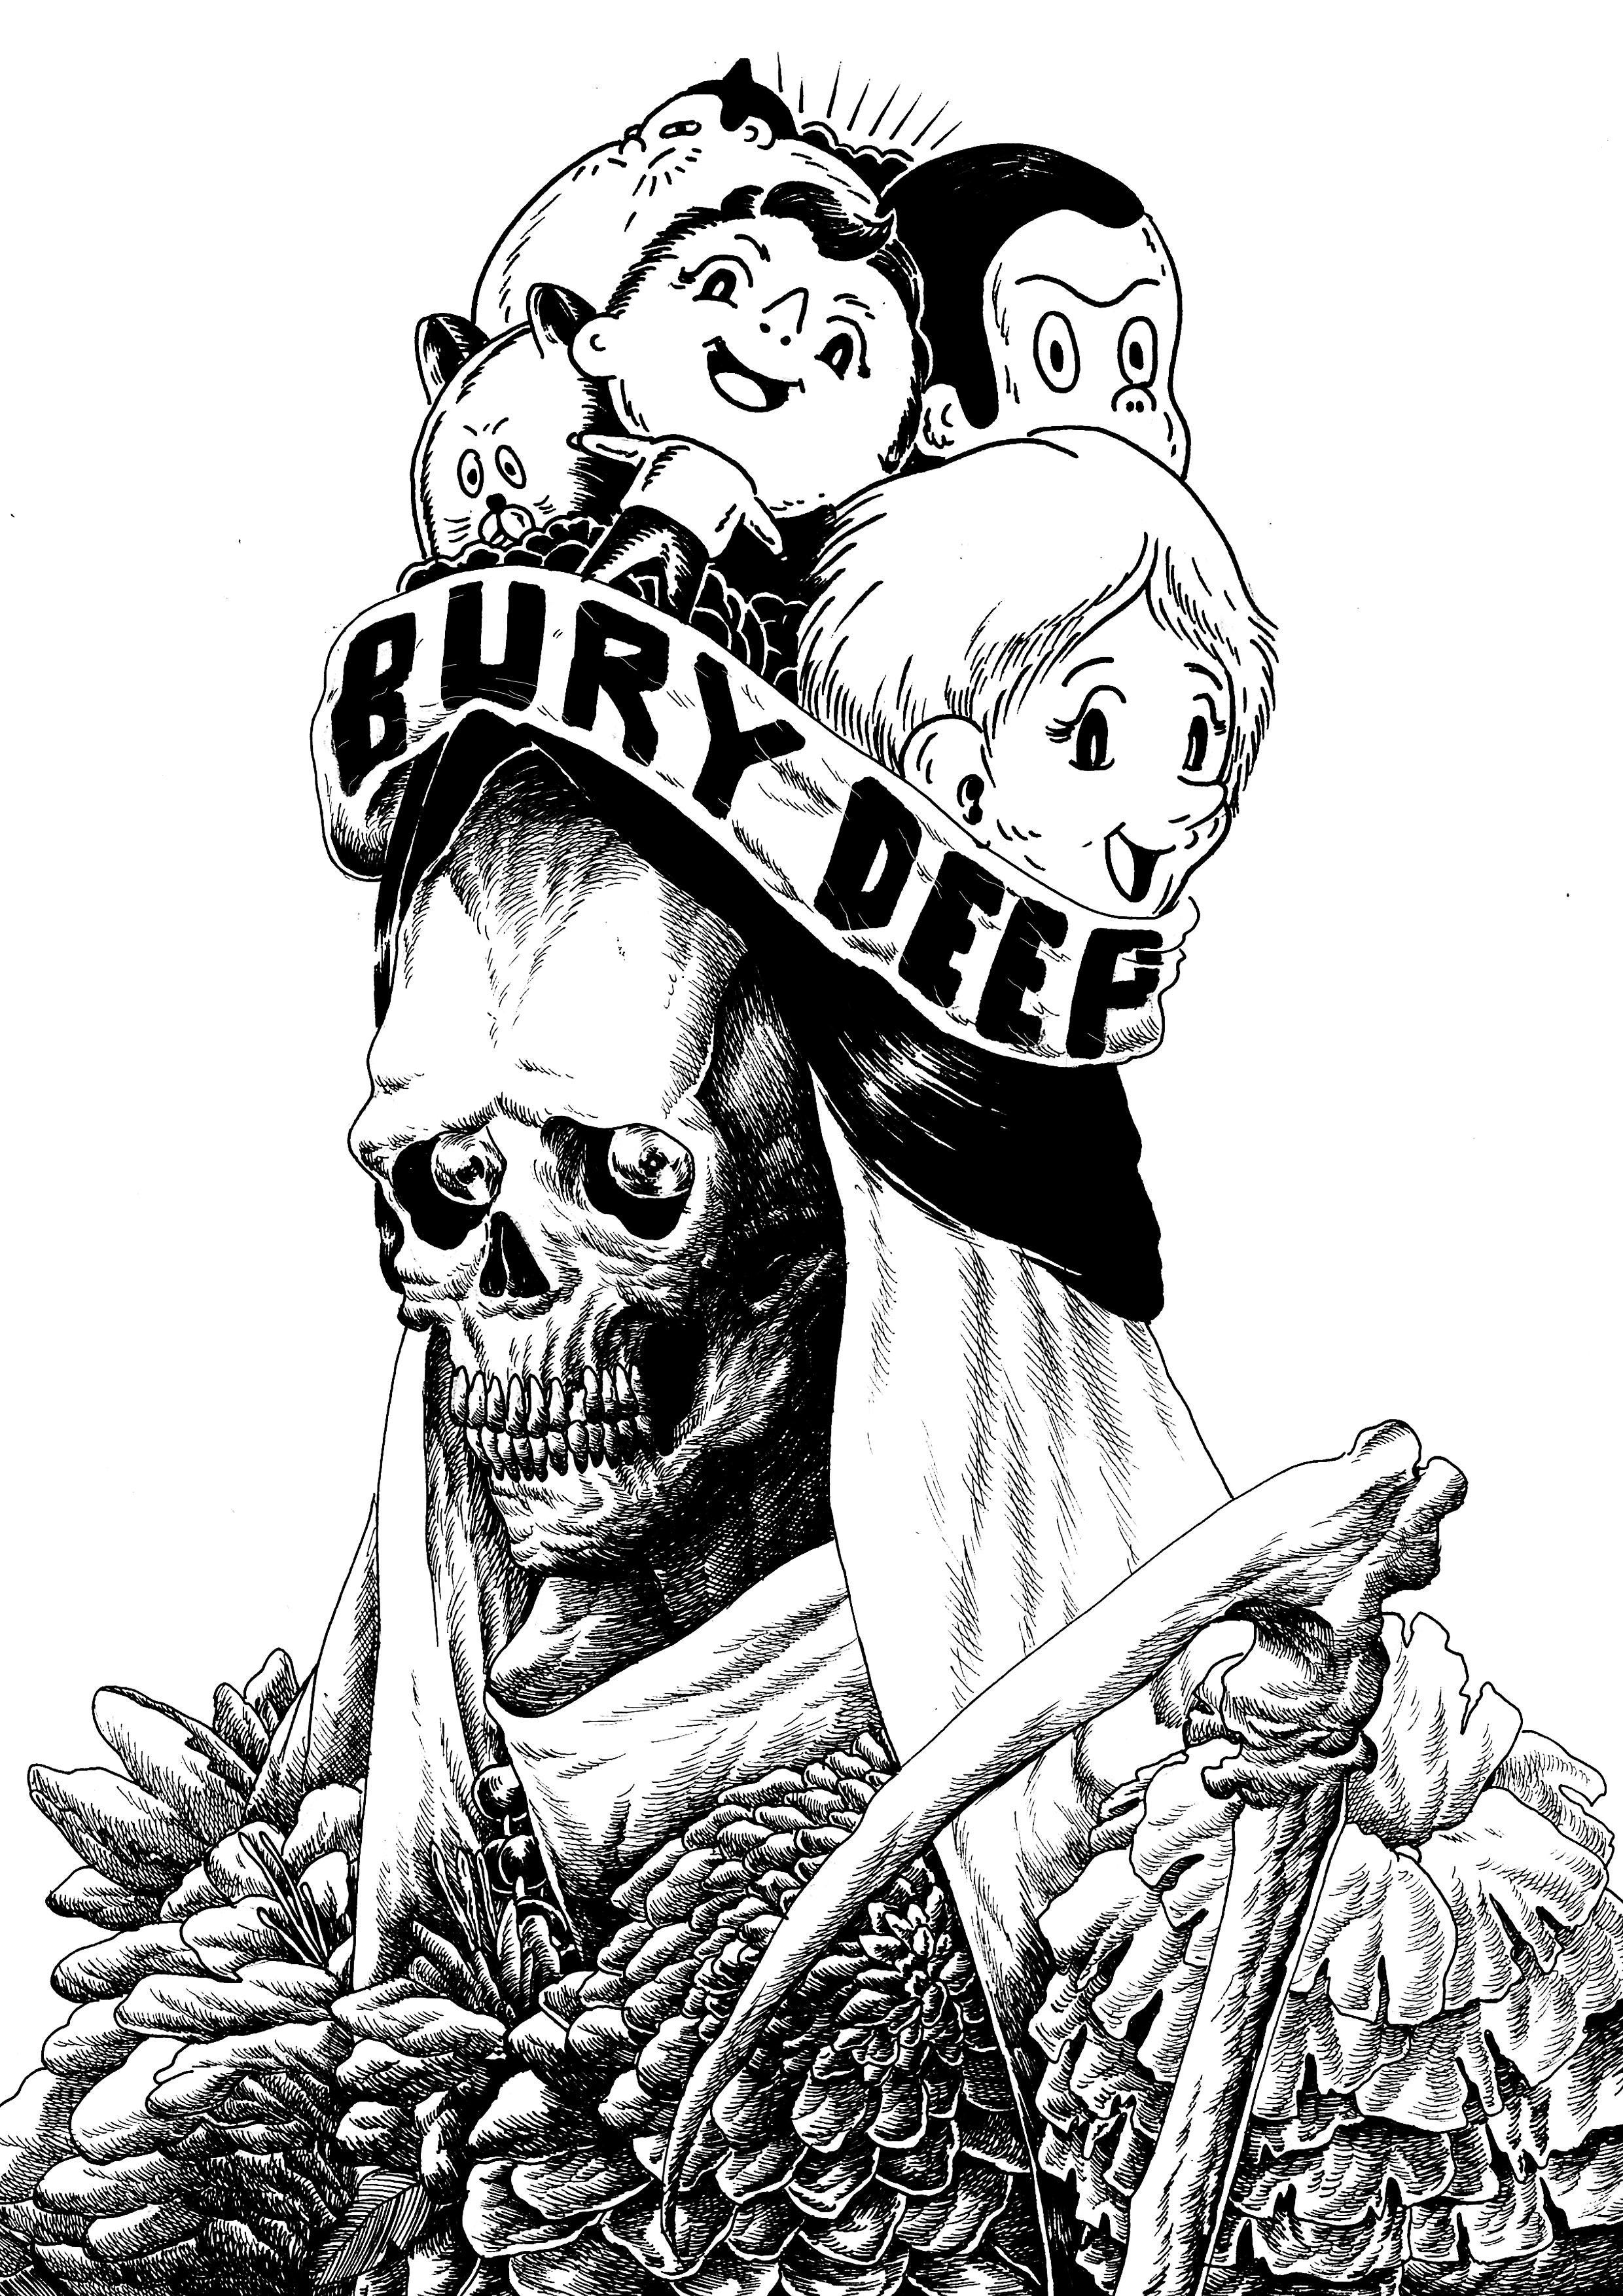 Bury Deep